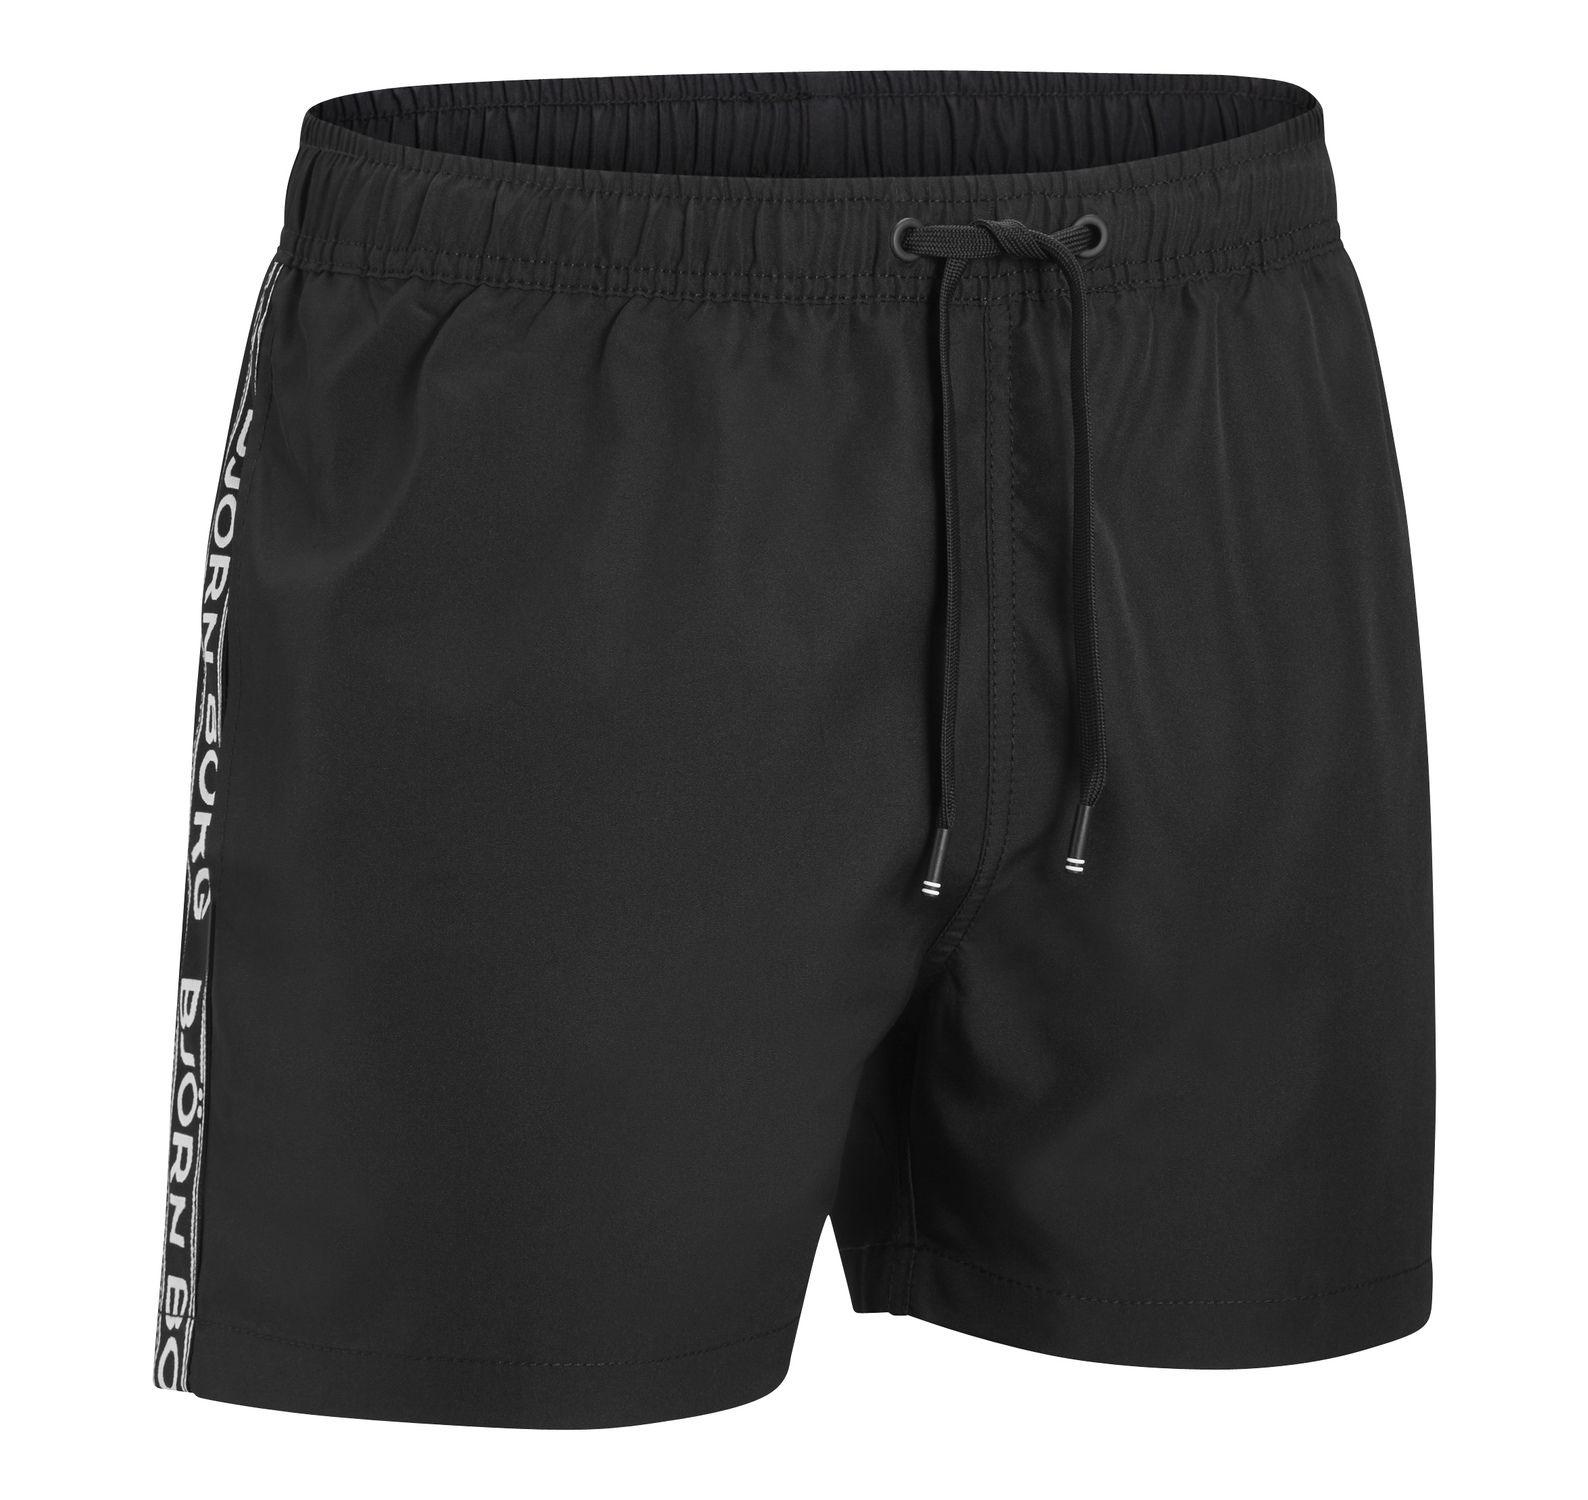 1p Swim Shorts Seasonal Solids, Black, Xs,  Björn Borg